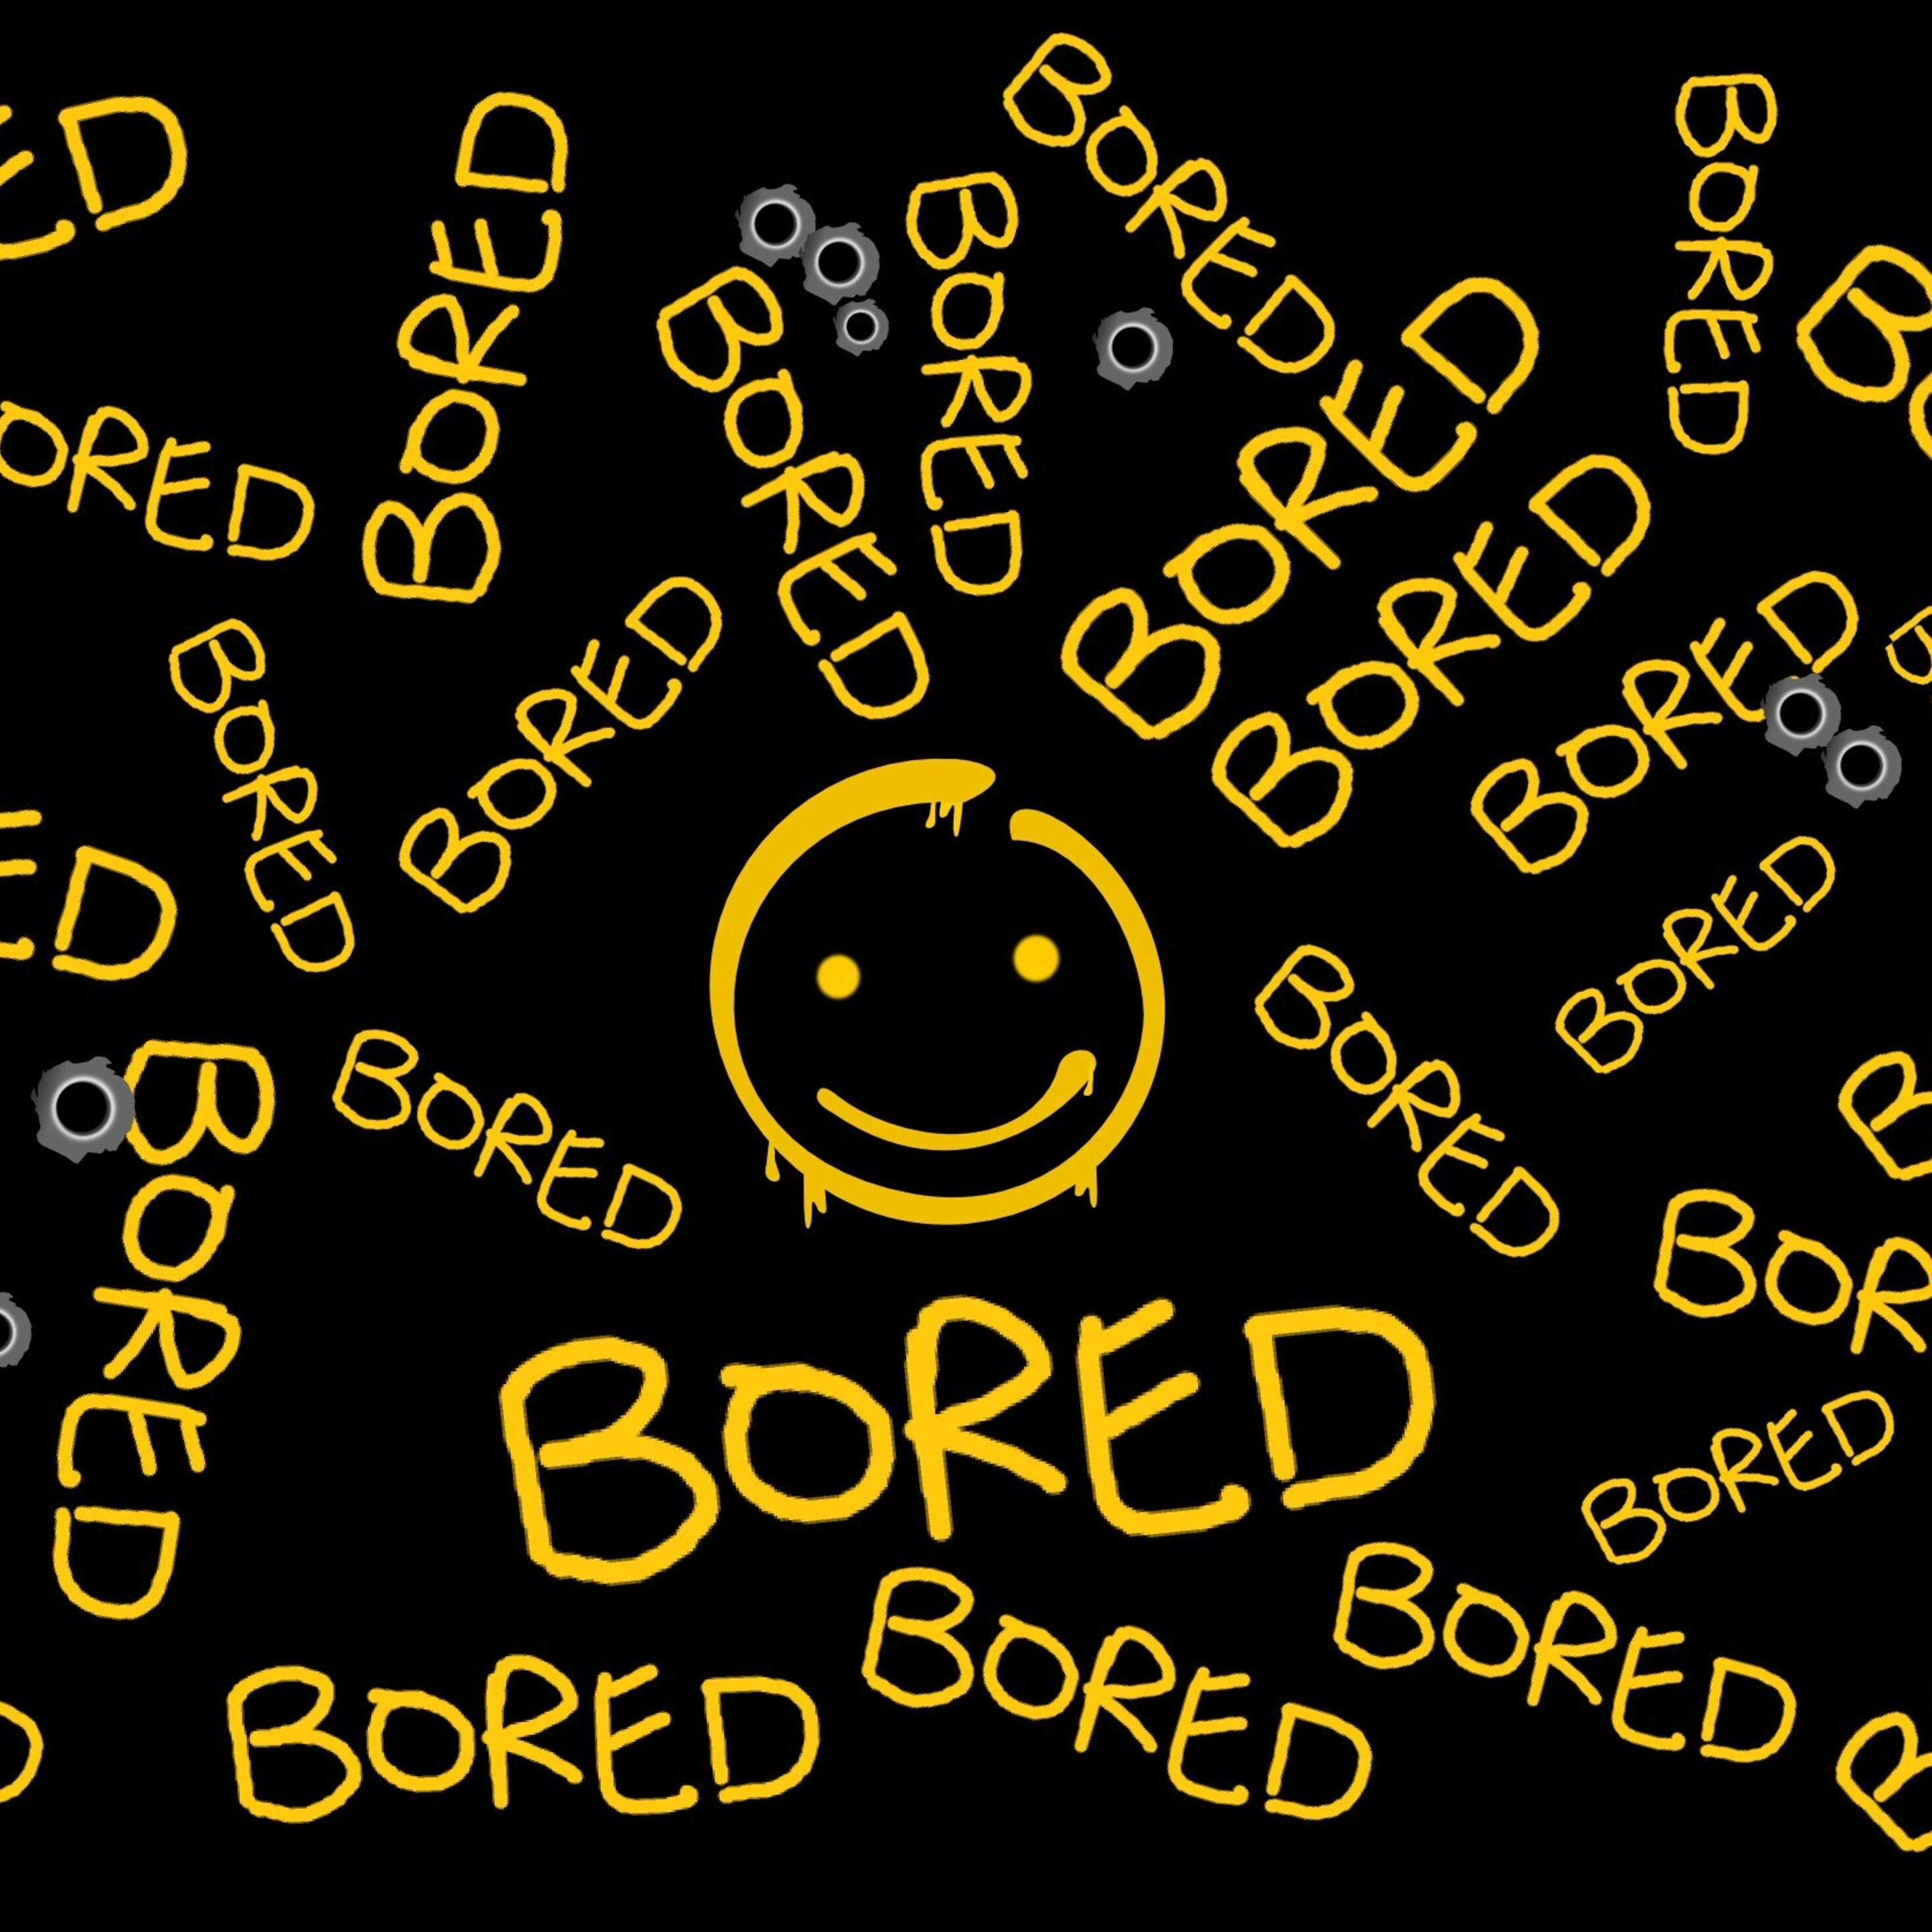 bored-typography-ji.jpg